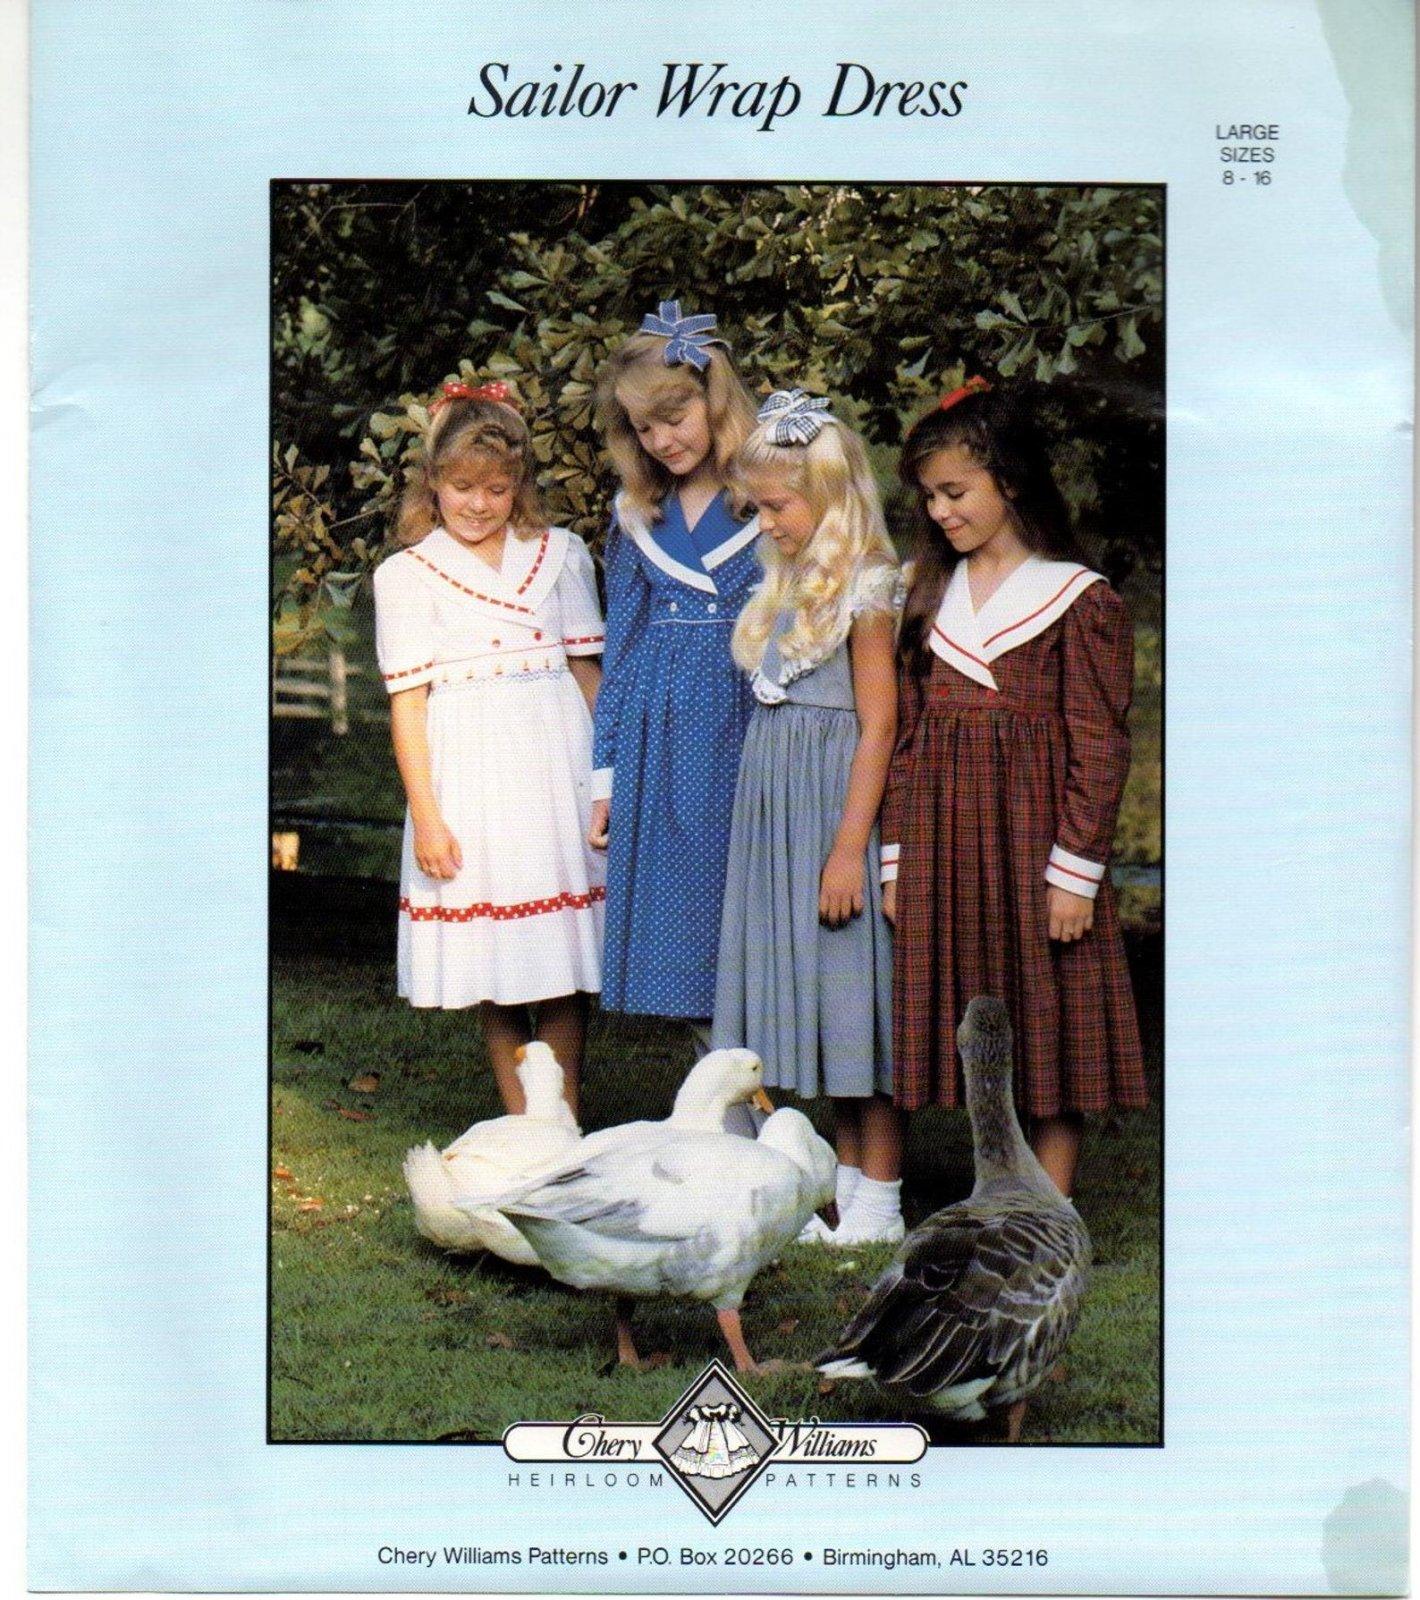 Chery Williams  - Sailor Wrap Dress